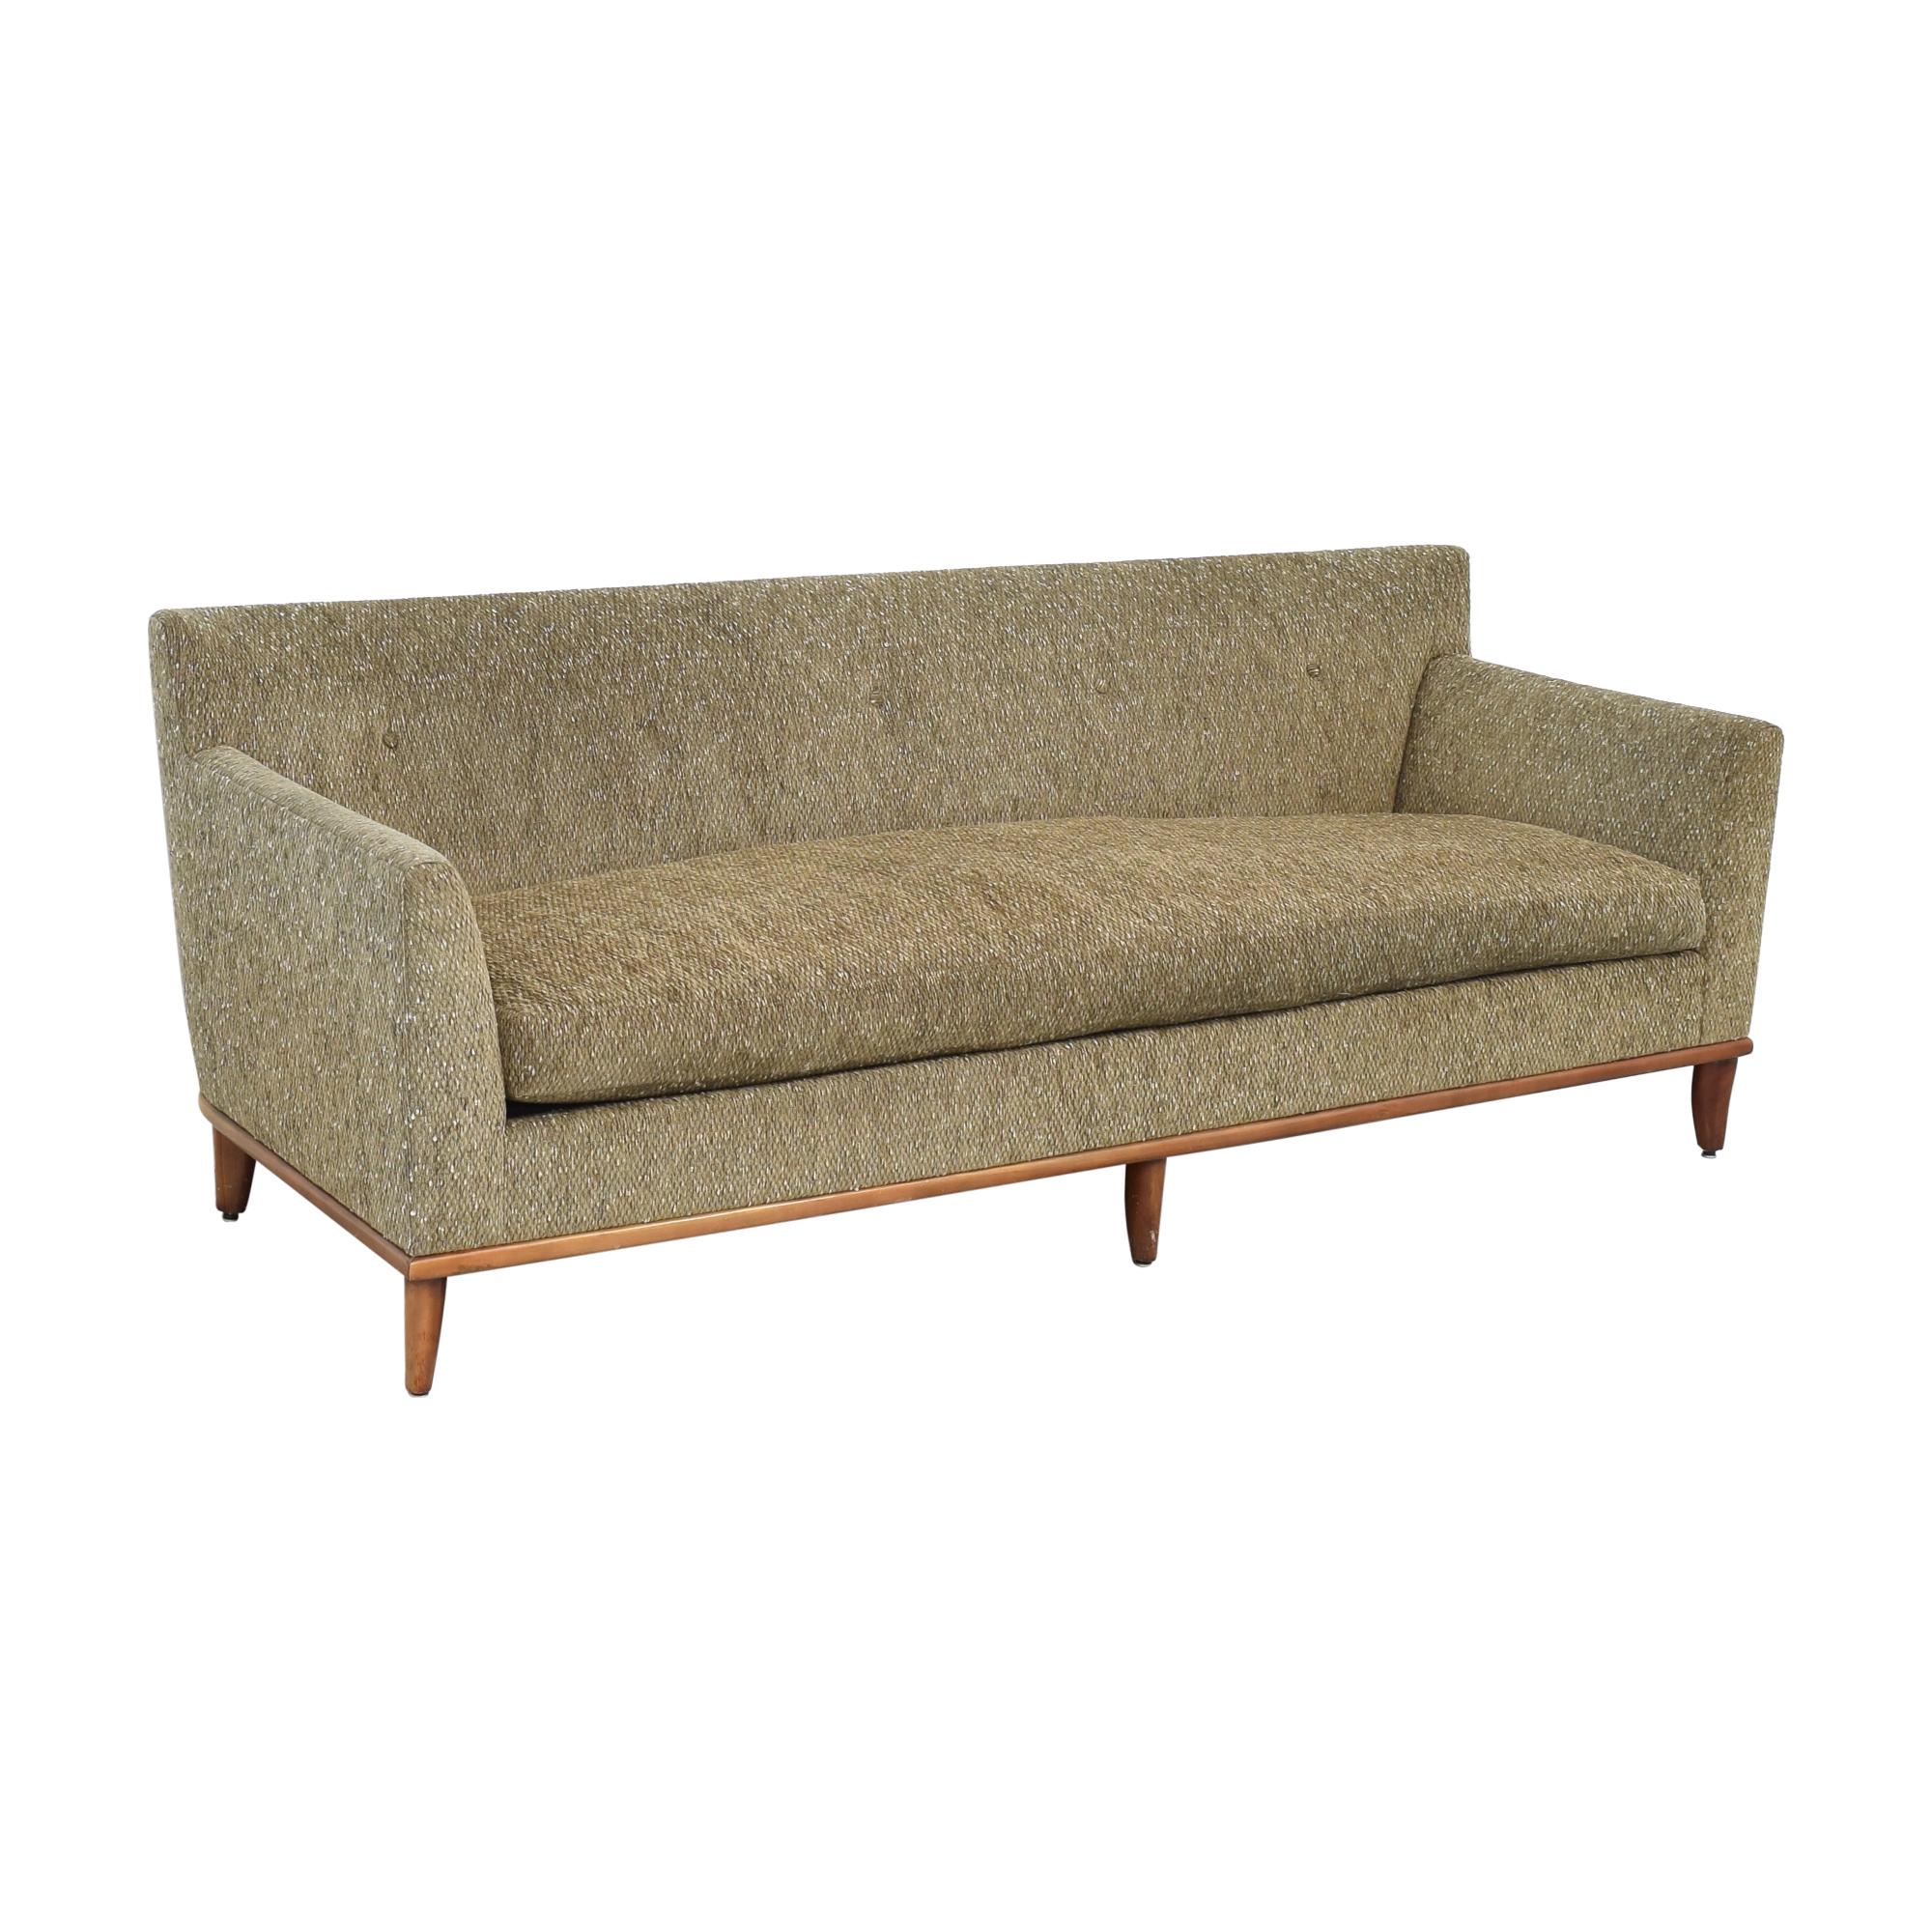 Bright Single Cushion Sofa / Classic Sofas